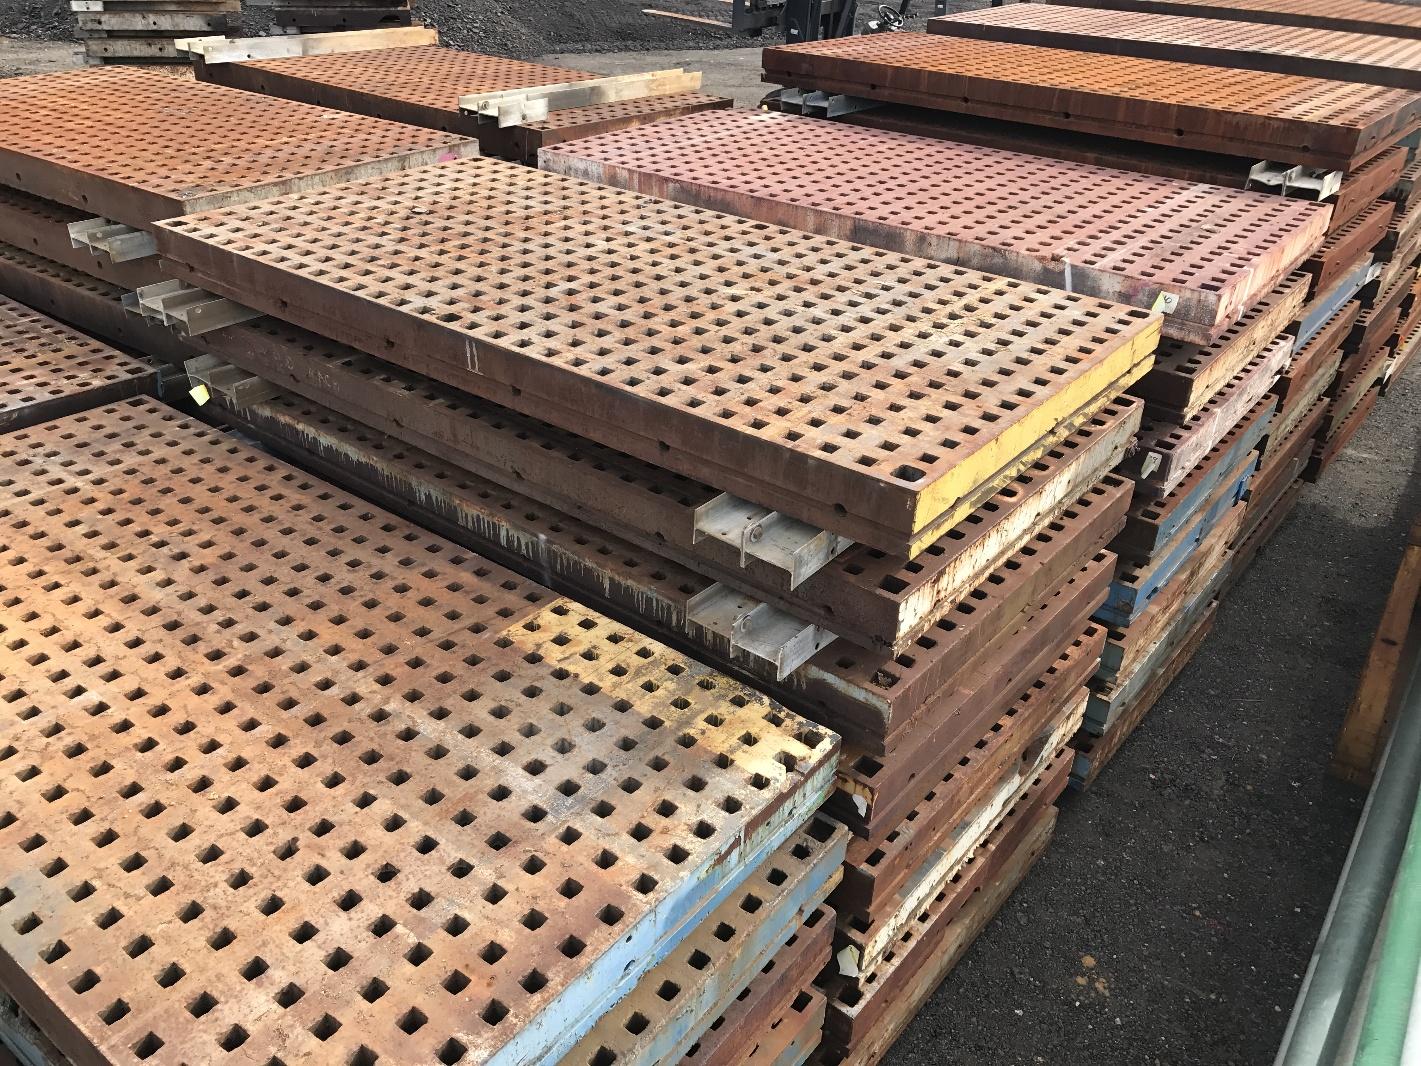 5 ft. x 10 ft. acorn welding platen layout table 5x10 | ebay arc welding block diagram